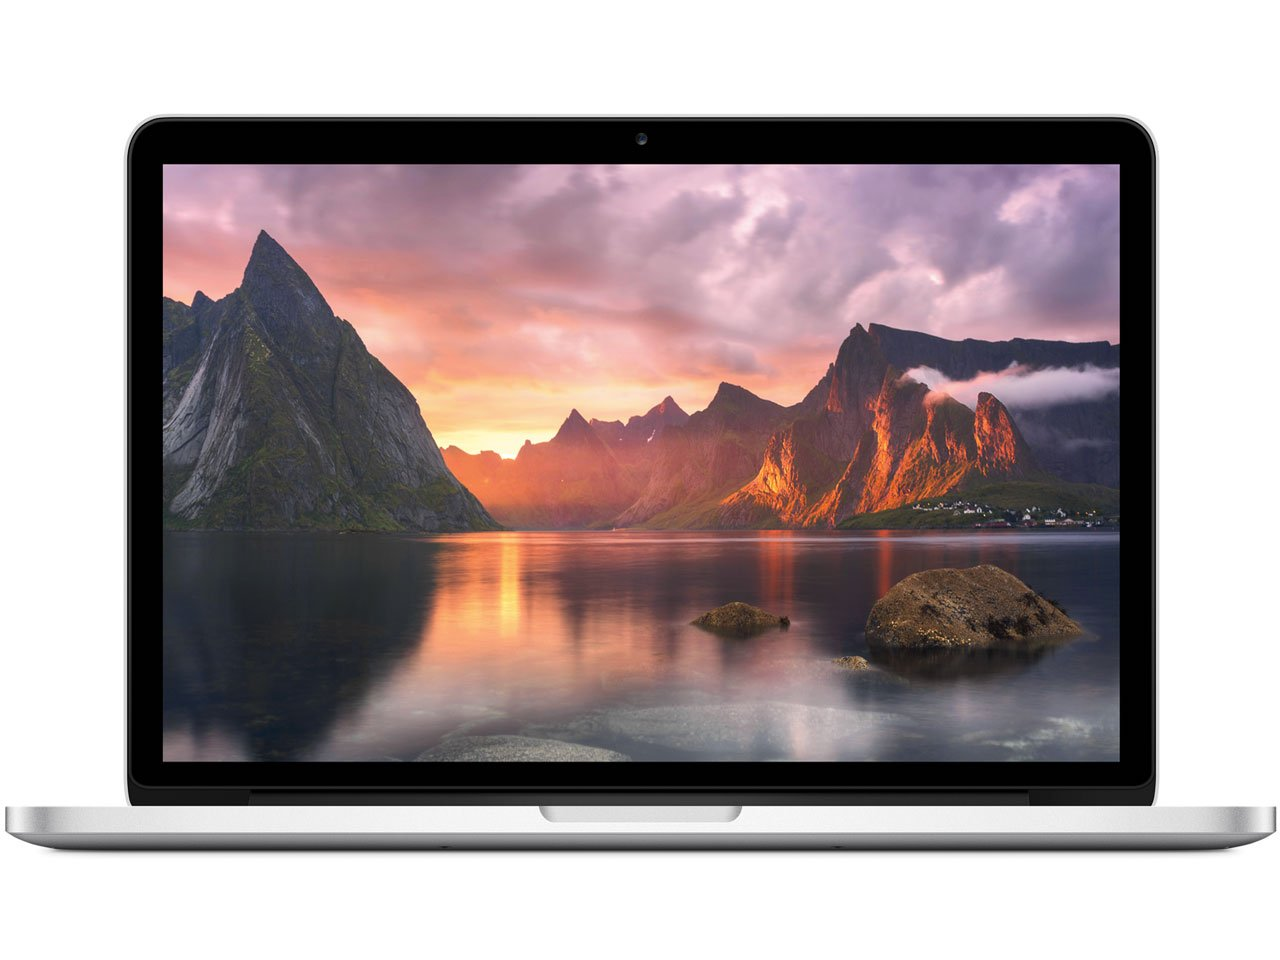 MacBook Pro MF840J/A